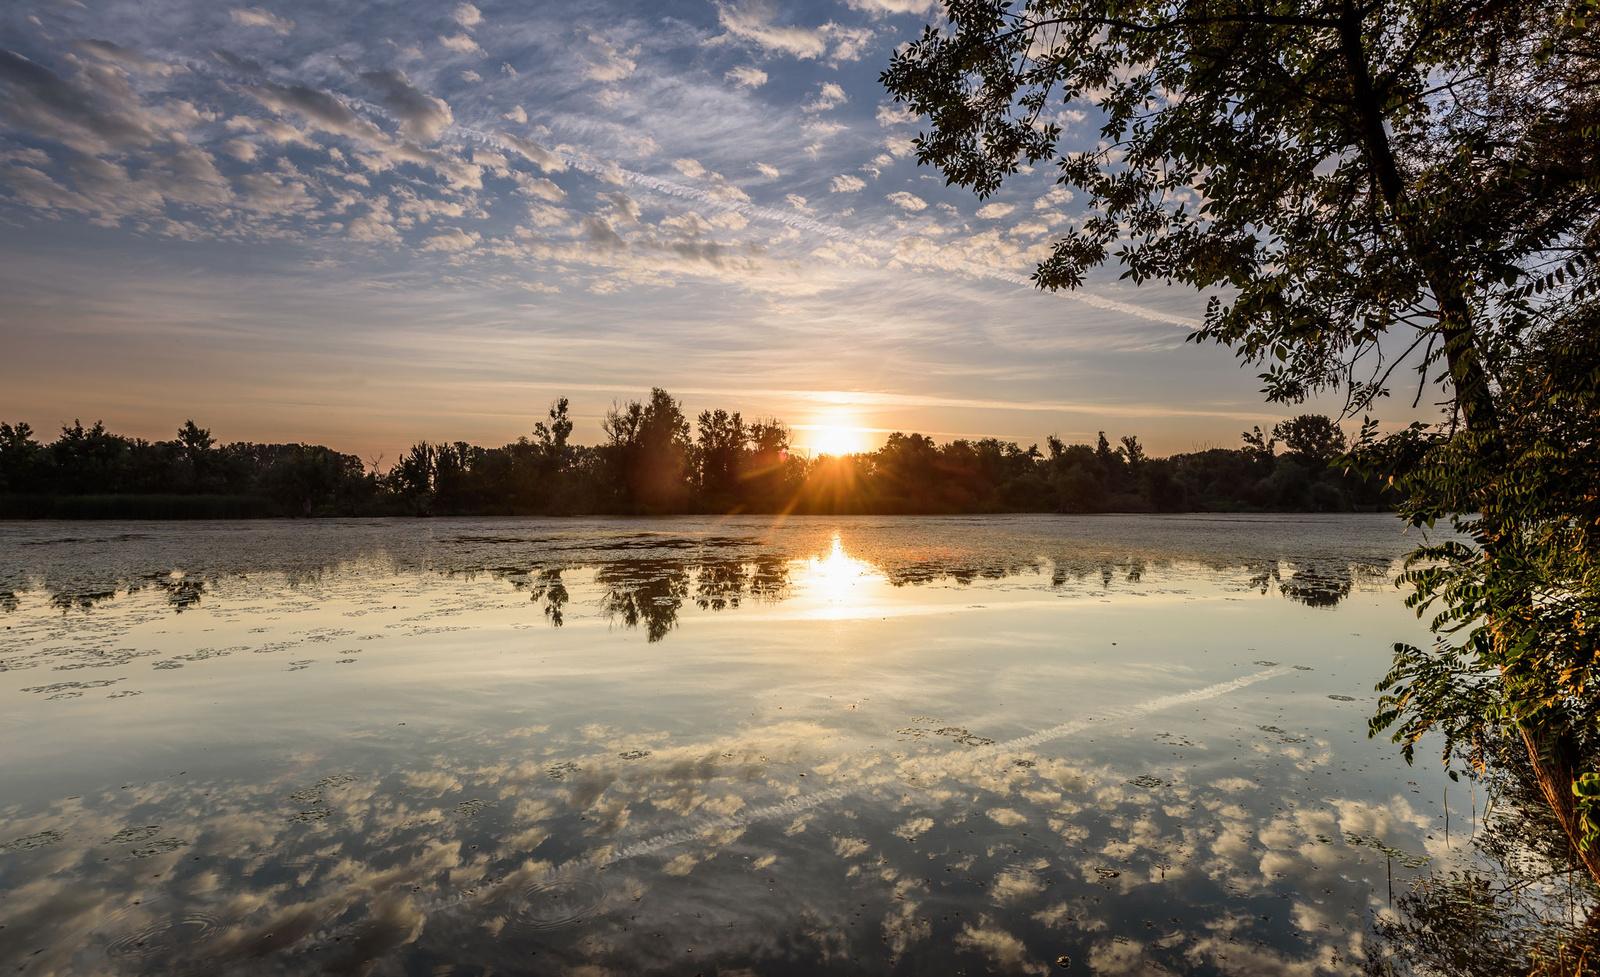 Hajnali tükörkép